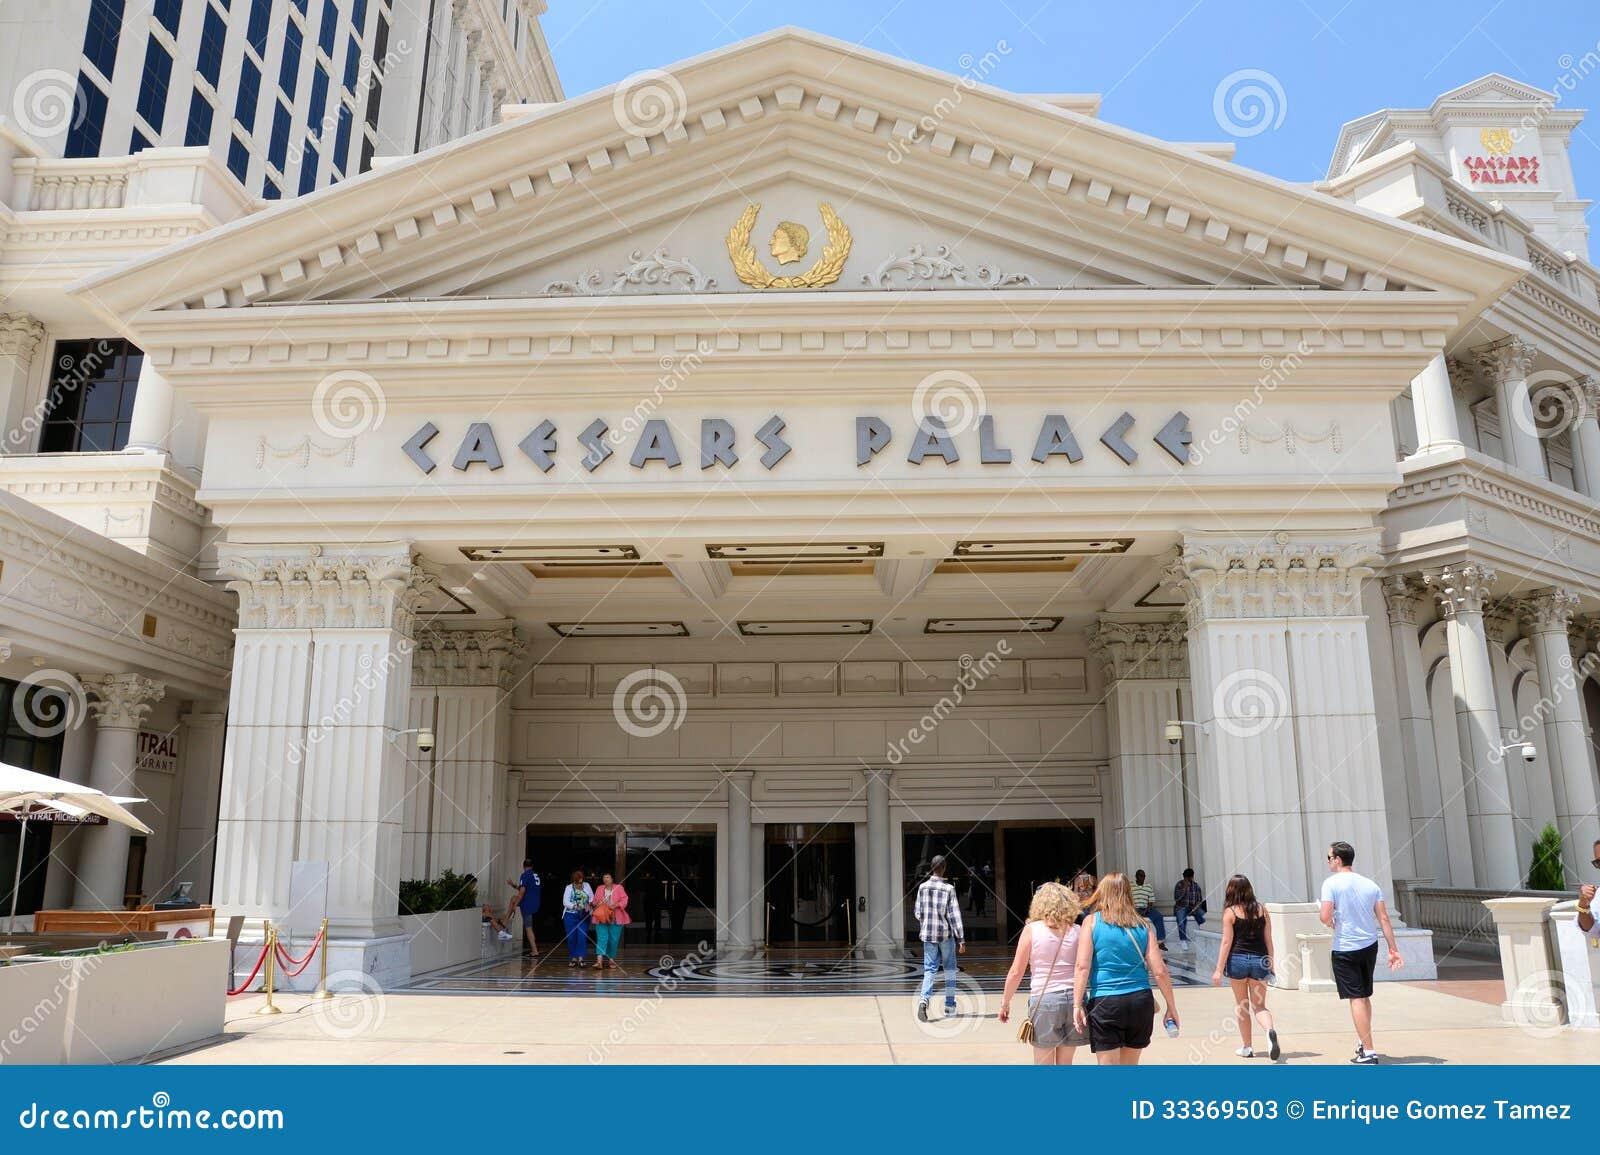 caesars palace online casino  spiele download